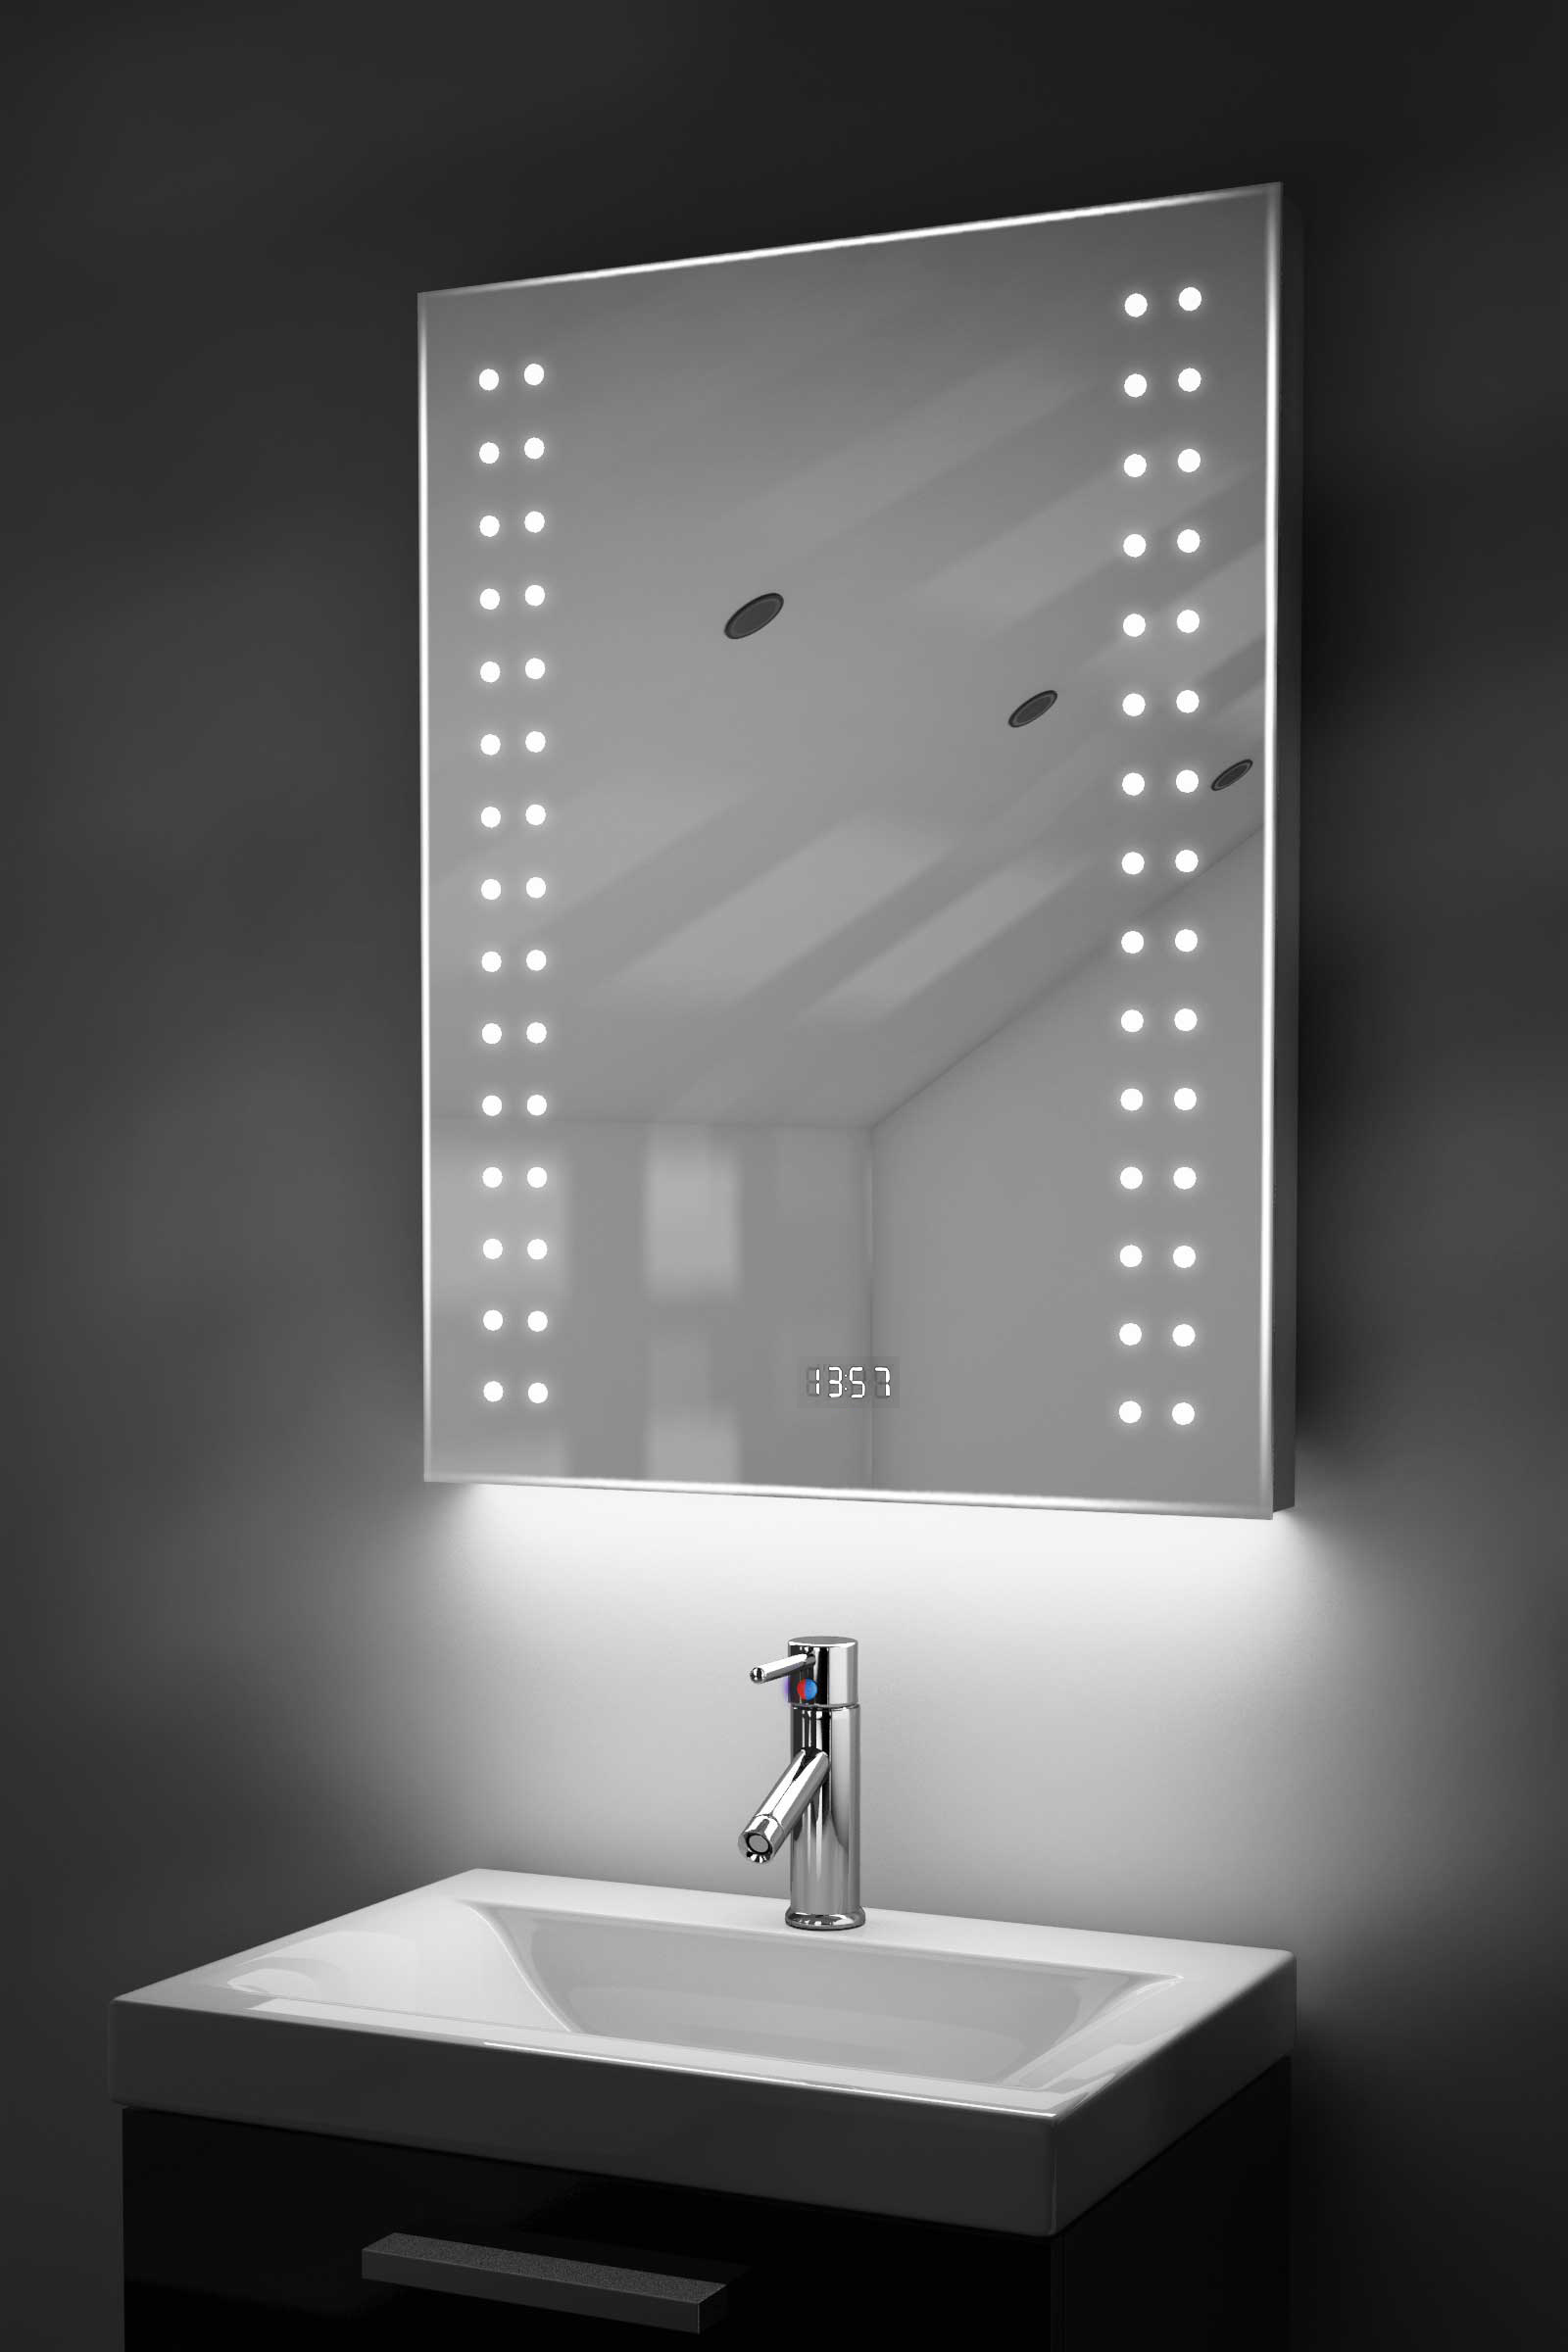 Digital Clock Slim Bathroom Mirror With Under Lighting Demist Sensor K186 Ebay